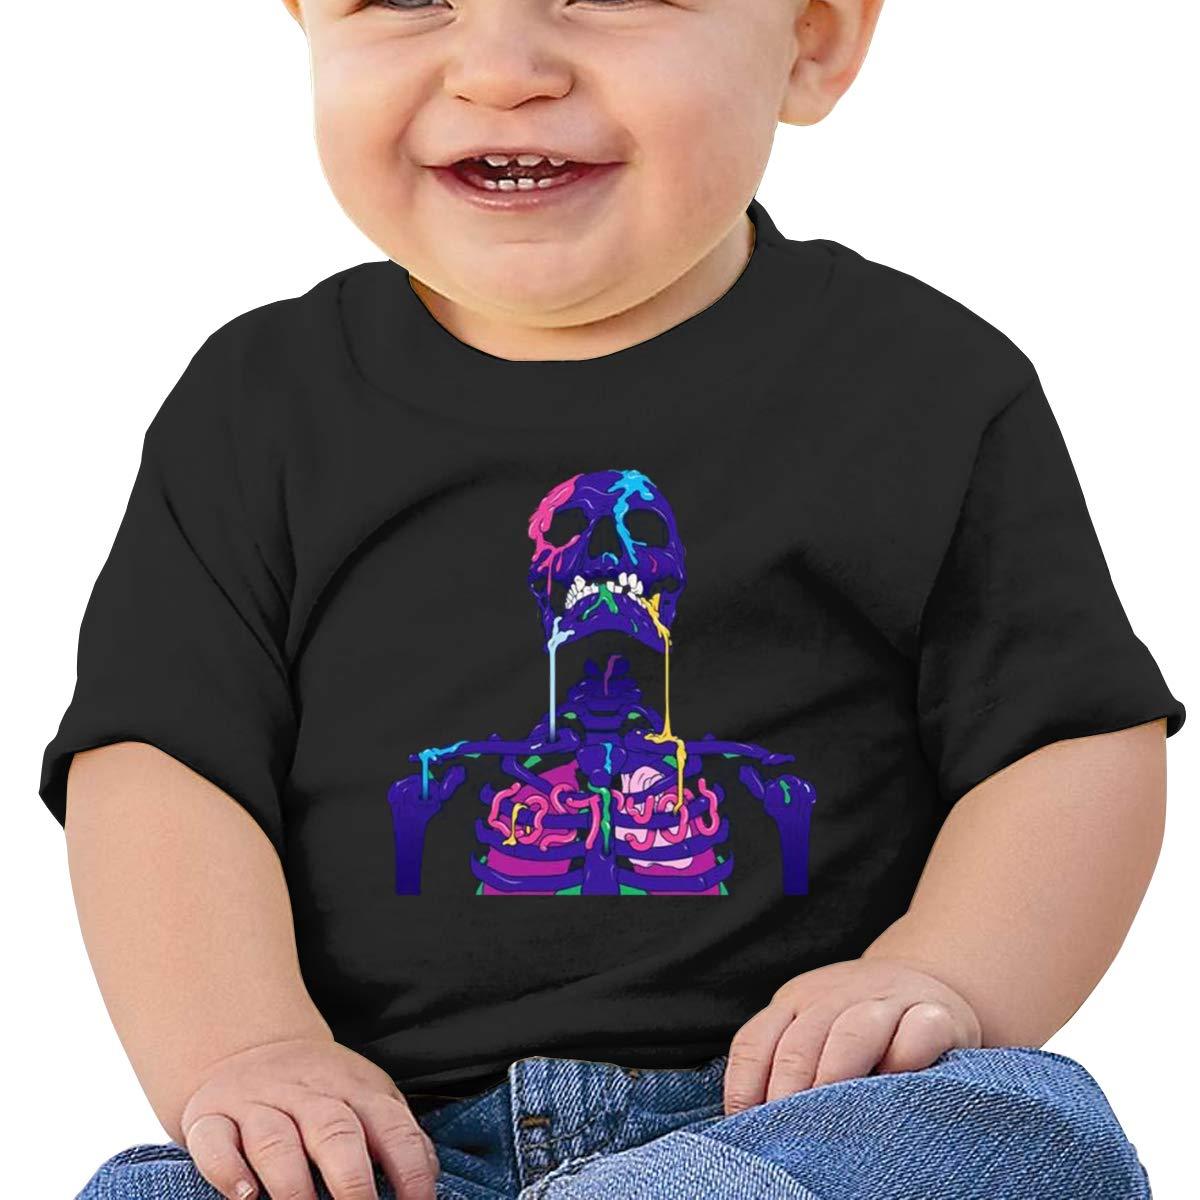 MONIKAL Unisex Infant Short Sleeve T-Shirt Zeds-Dead Toddler Kids Organic Cotton Graphic Tee Tops